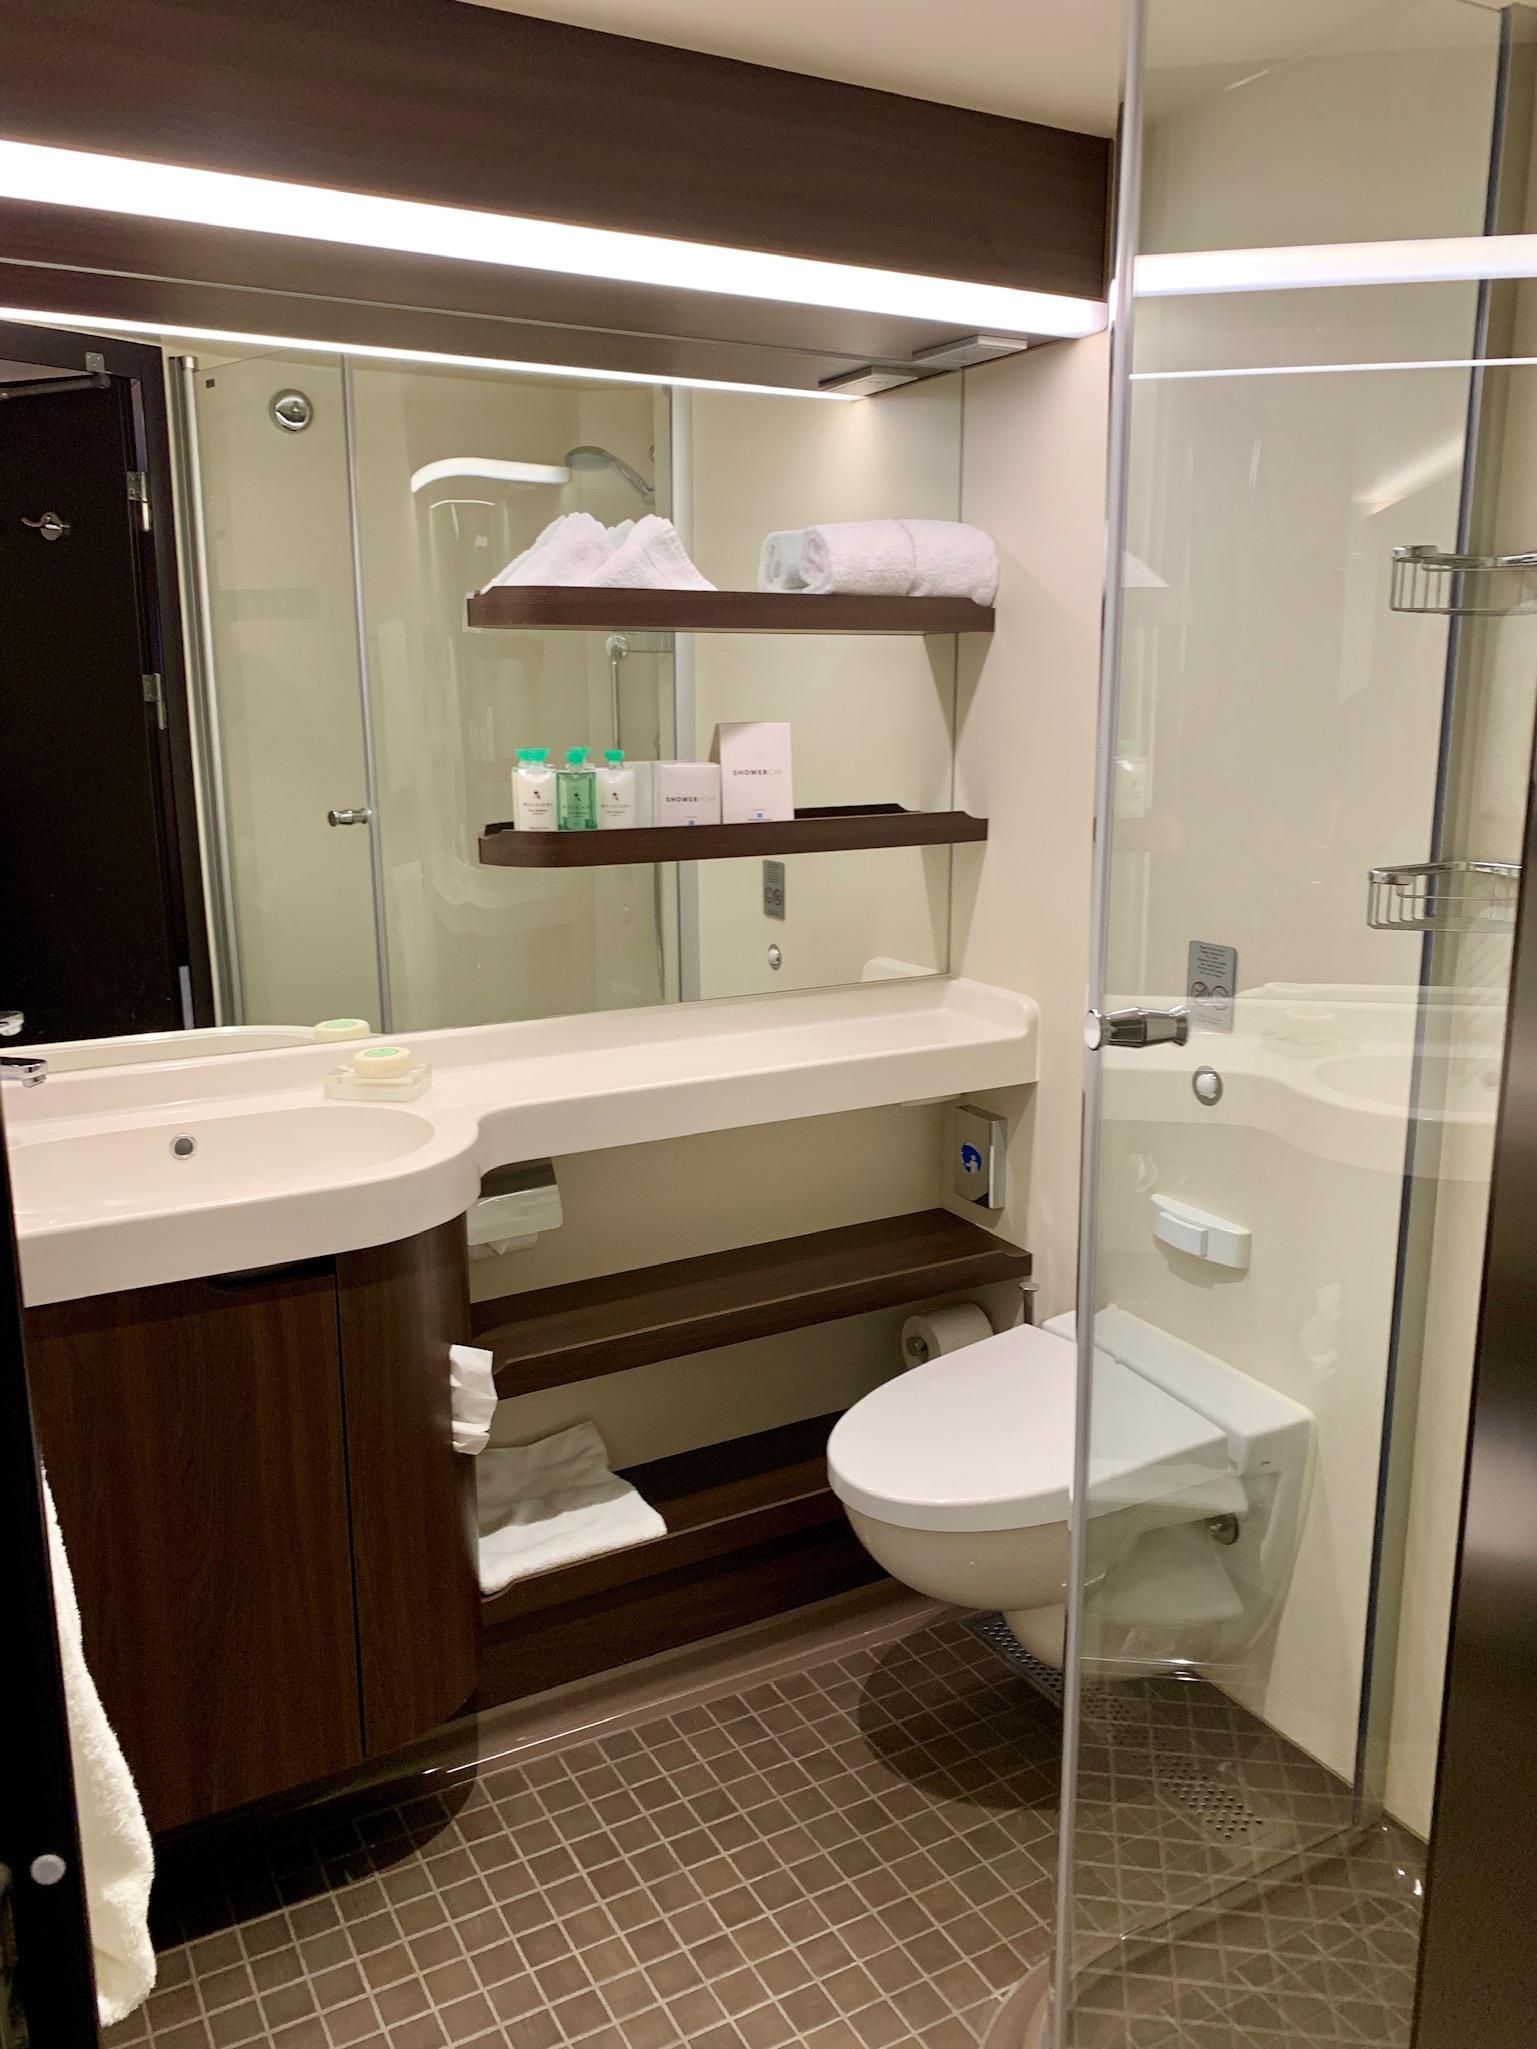 NCL Joy - Rooms - Haven 2 BR Family Villa Second Bath.jpg